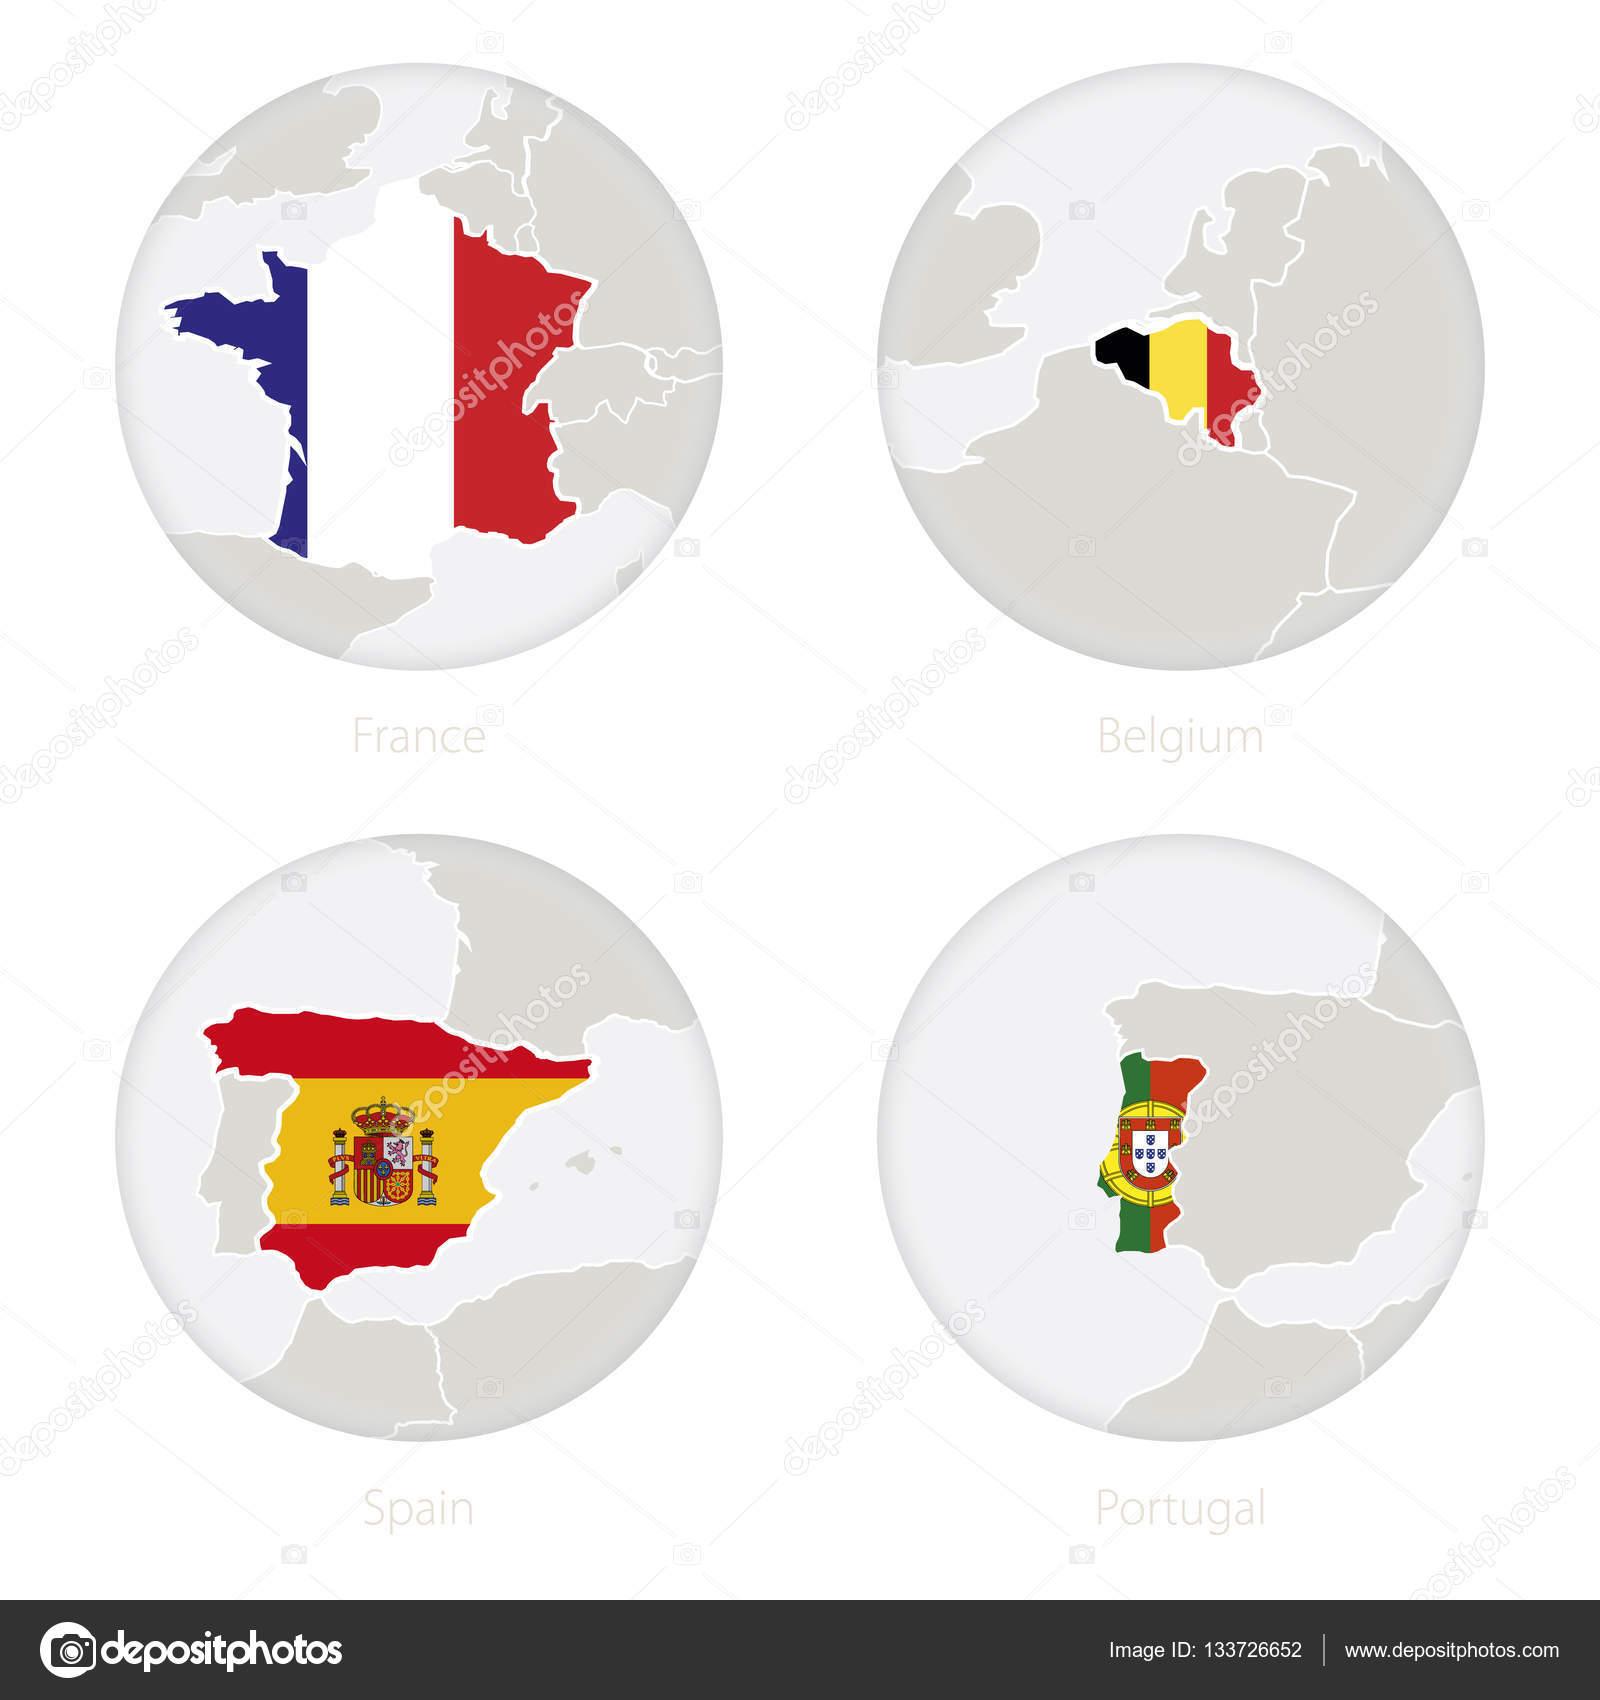 Carte Belgique Espagne.France Belgium Spain Portugal Map Contour And National